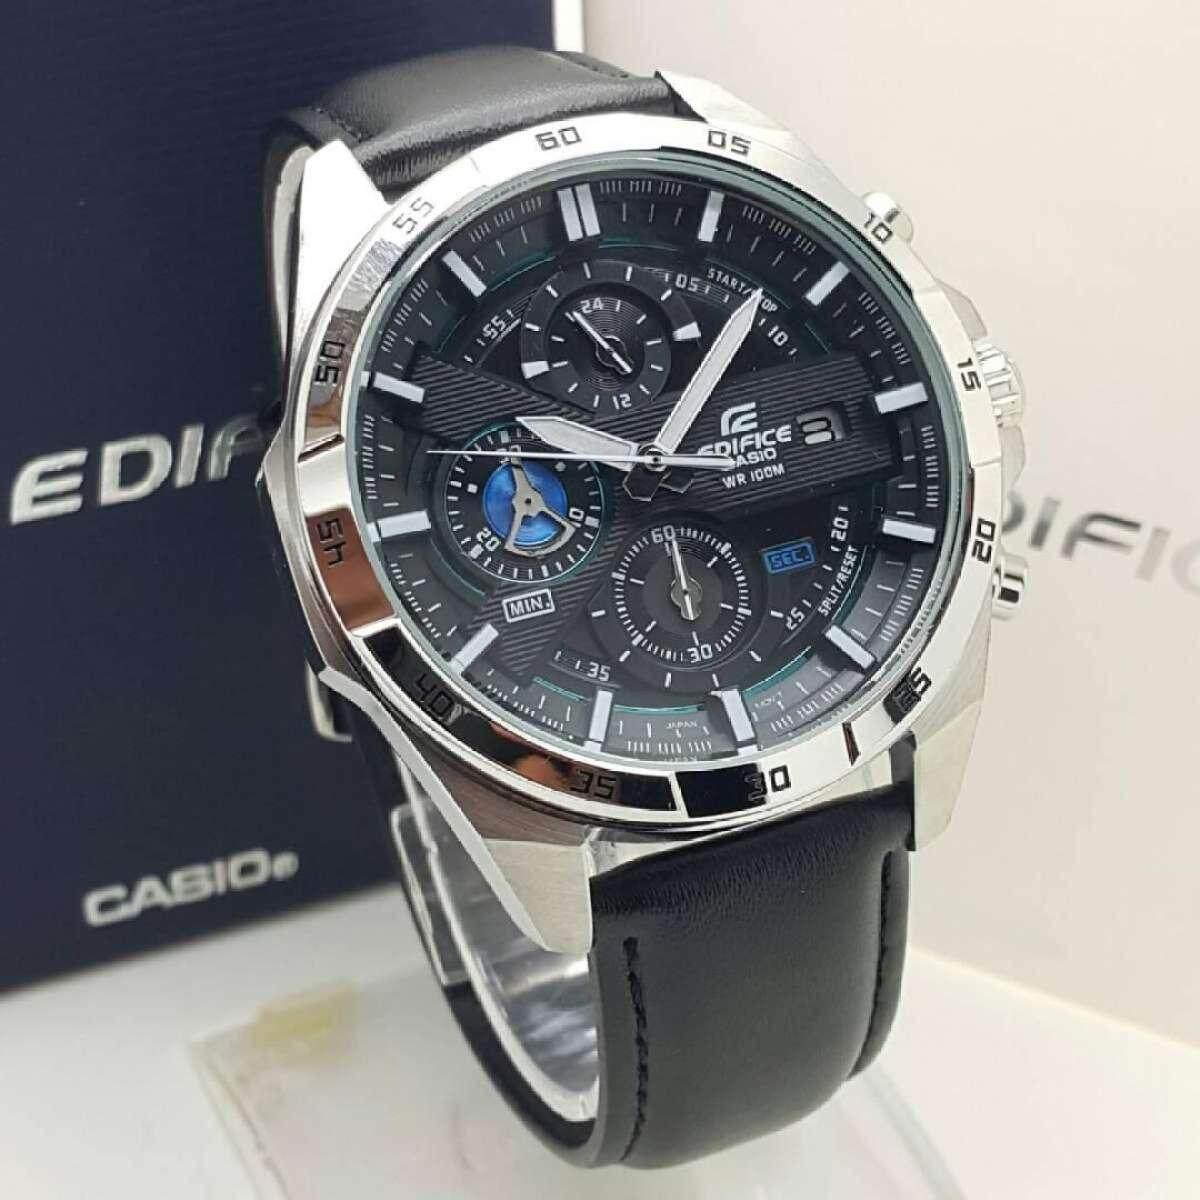 Casio Edifice Buy At Best Price In Malaysia Www Ediface 303l